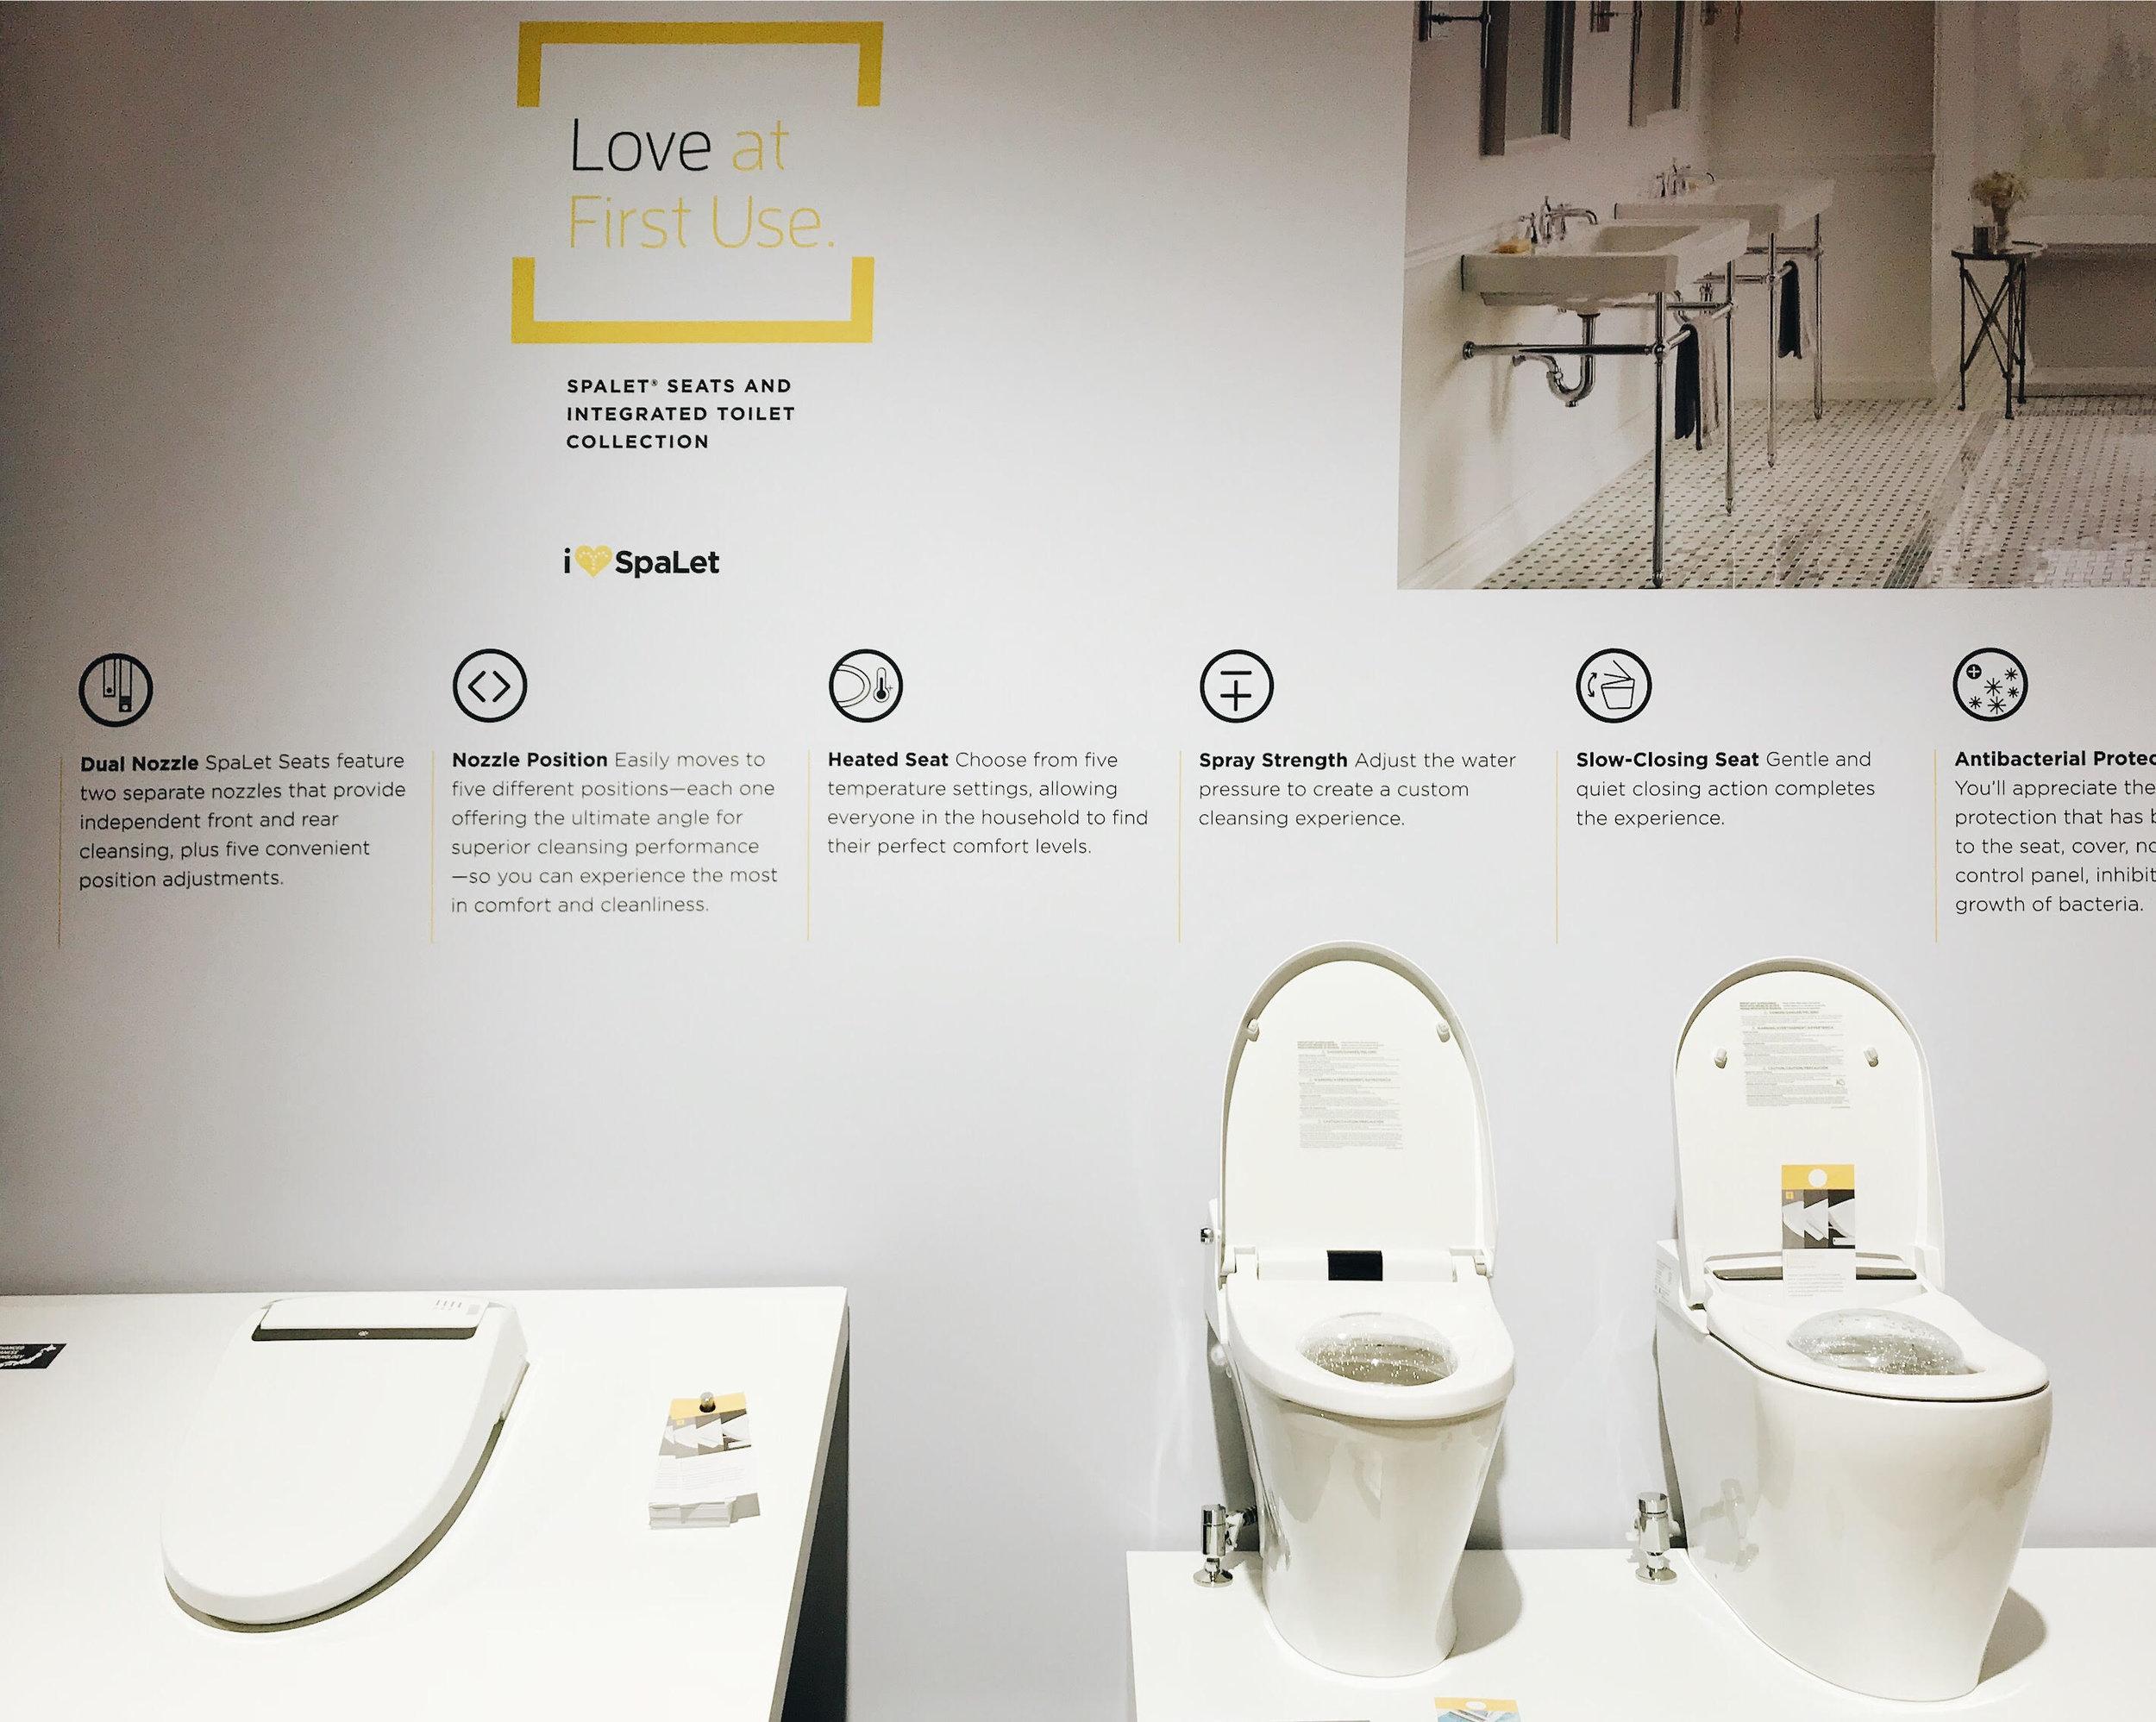 American Standard SpaLet Luxury Smart toilet, KBIS 2018, Bathroom Trends, BlogTour, Nyla Free Designs, Calgary Interior Designer, #designhounds